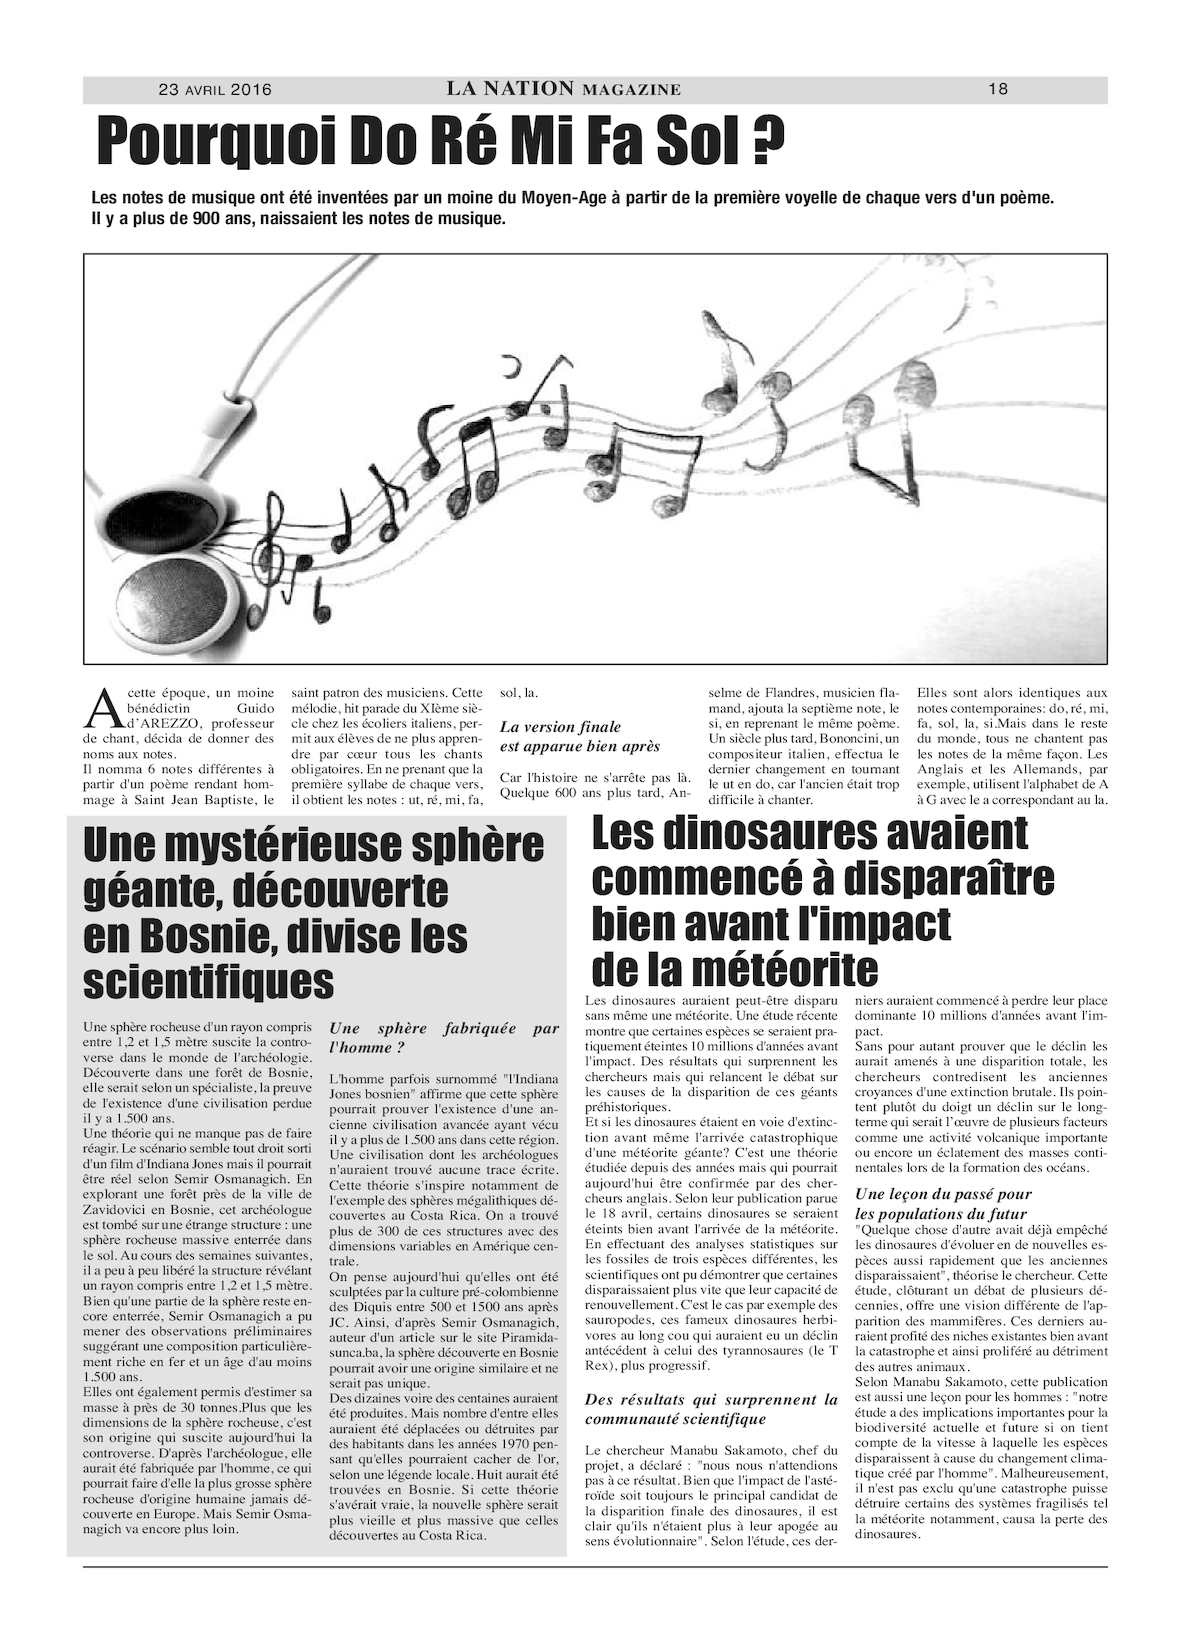 La Nation Edition N 937 Calameo Downloader